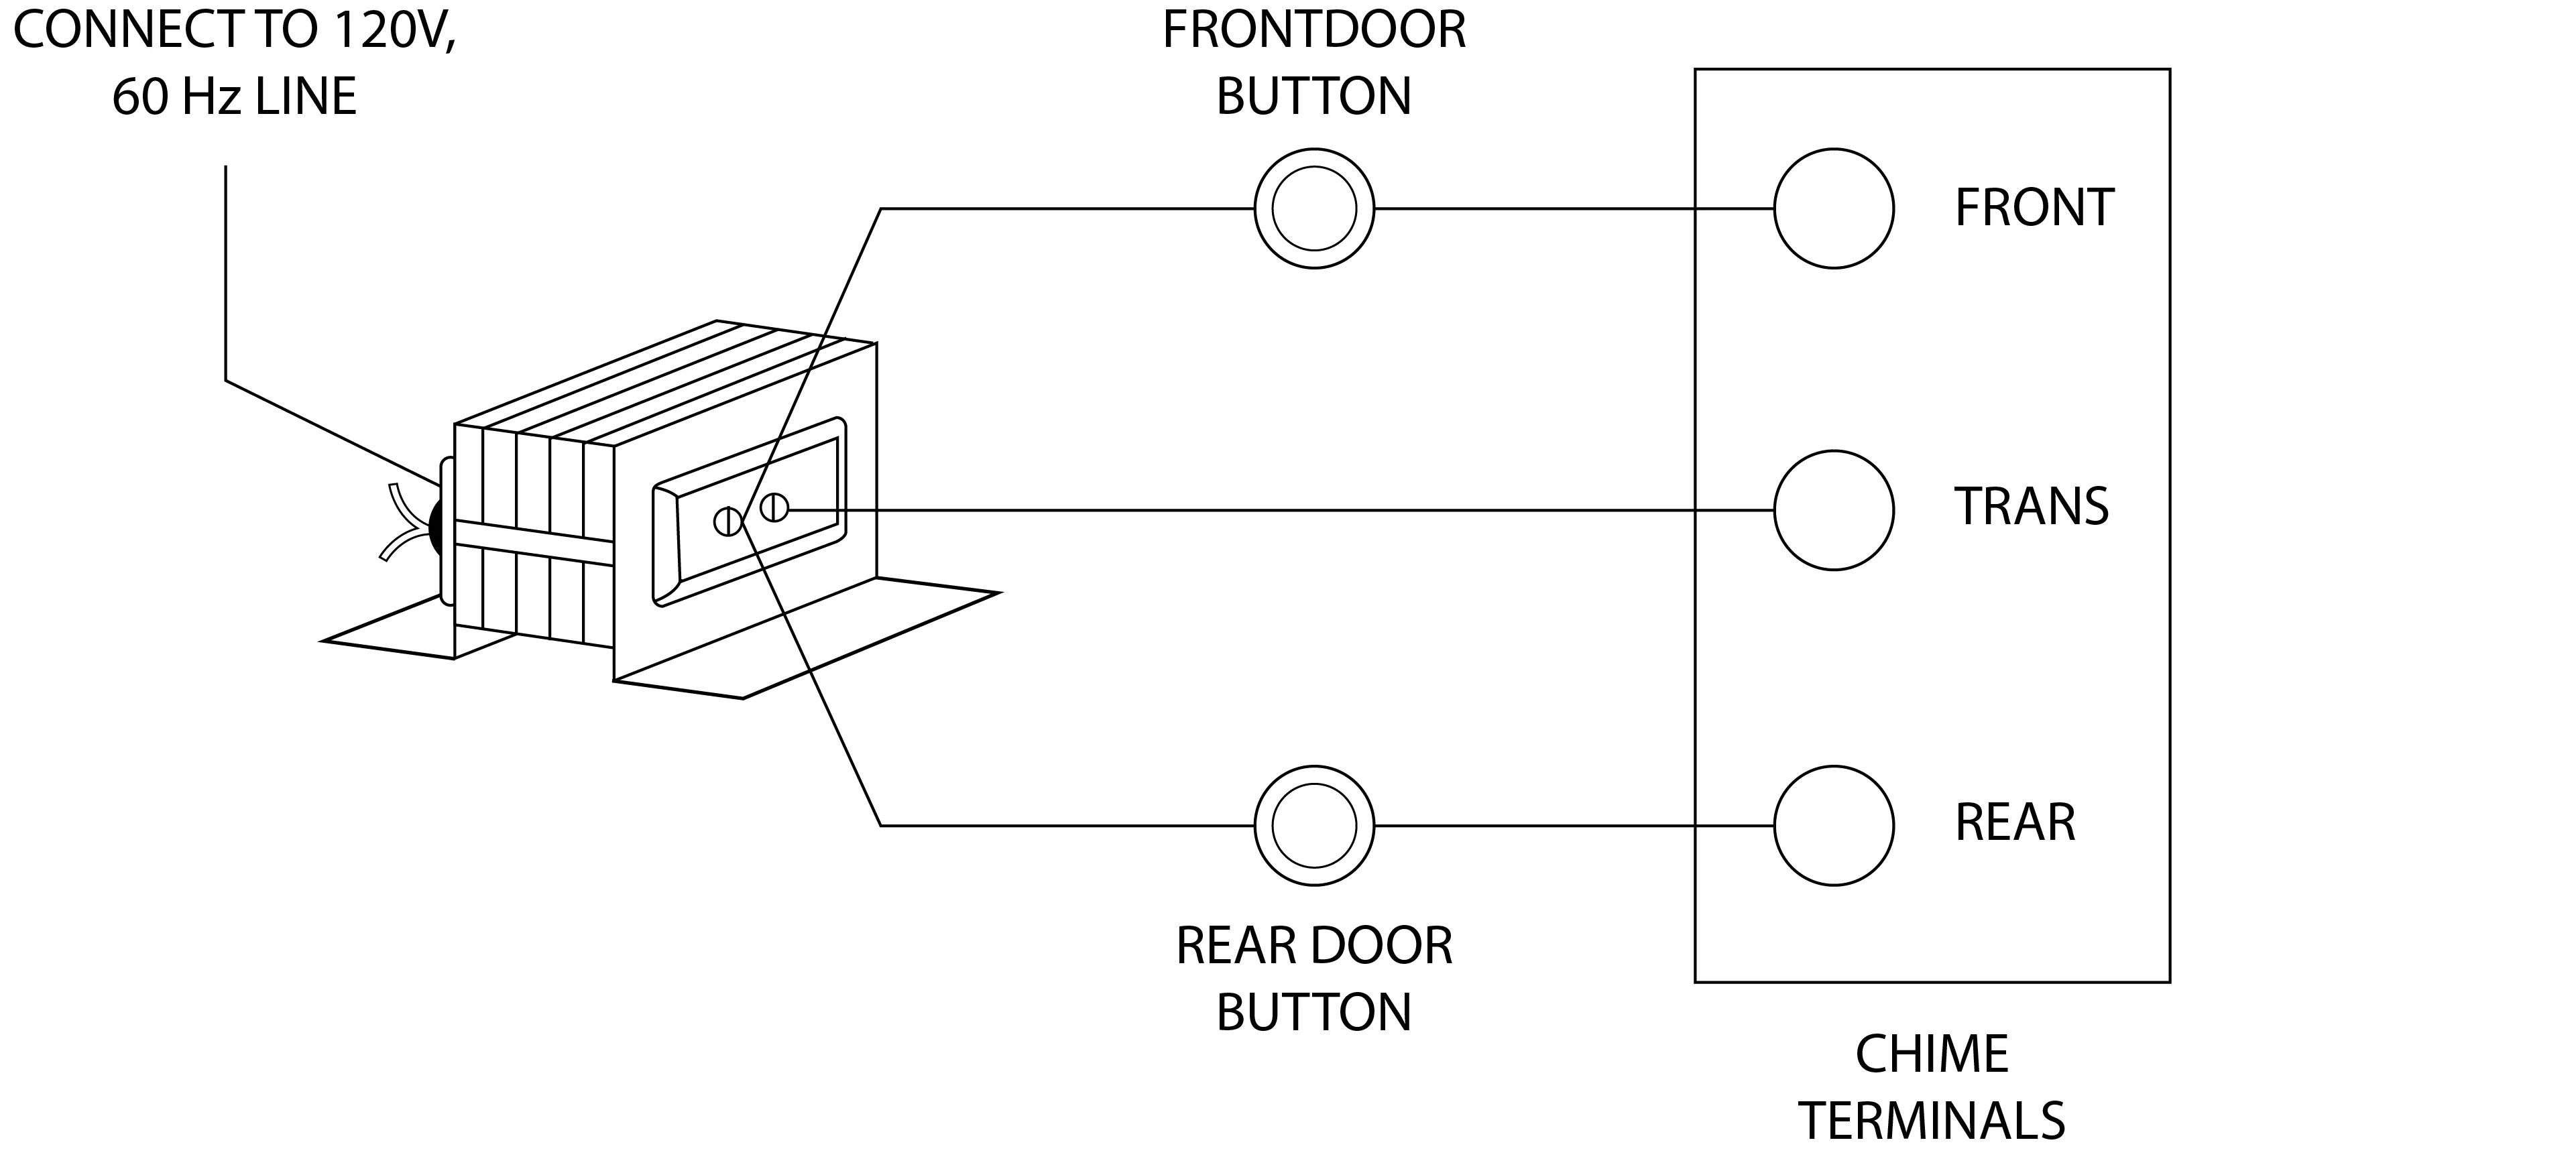 Byron Doorbell Transformer & Wiring Diagram For A